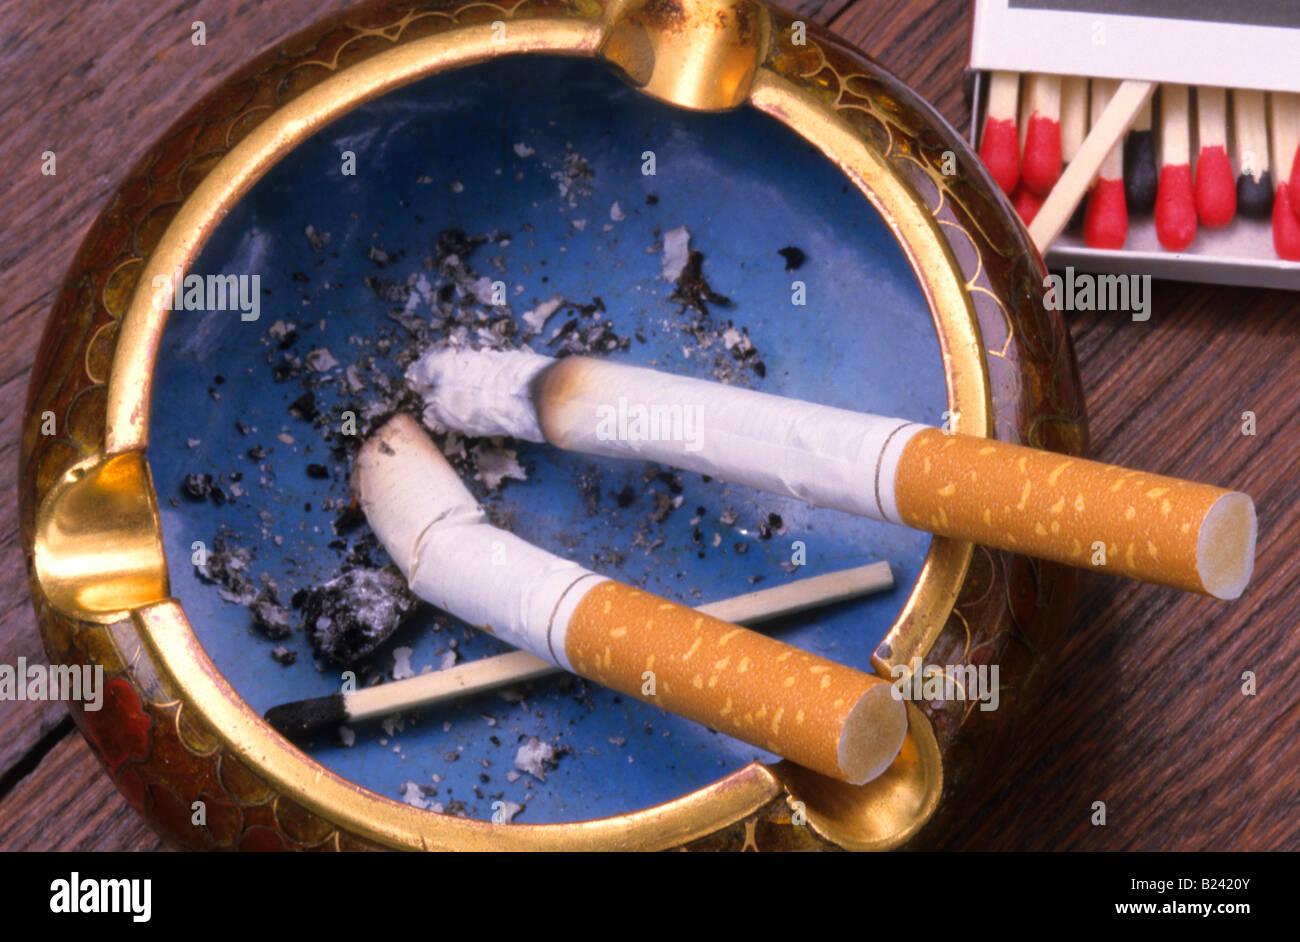 Two cigarettes burning in ashtray - Stock Image